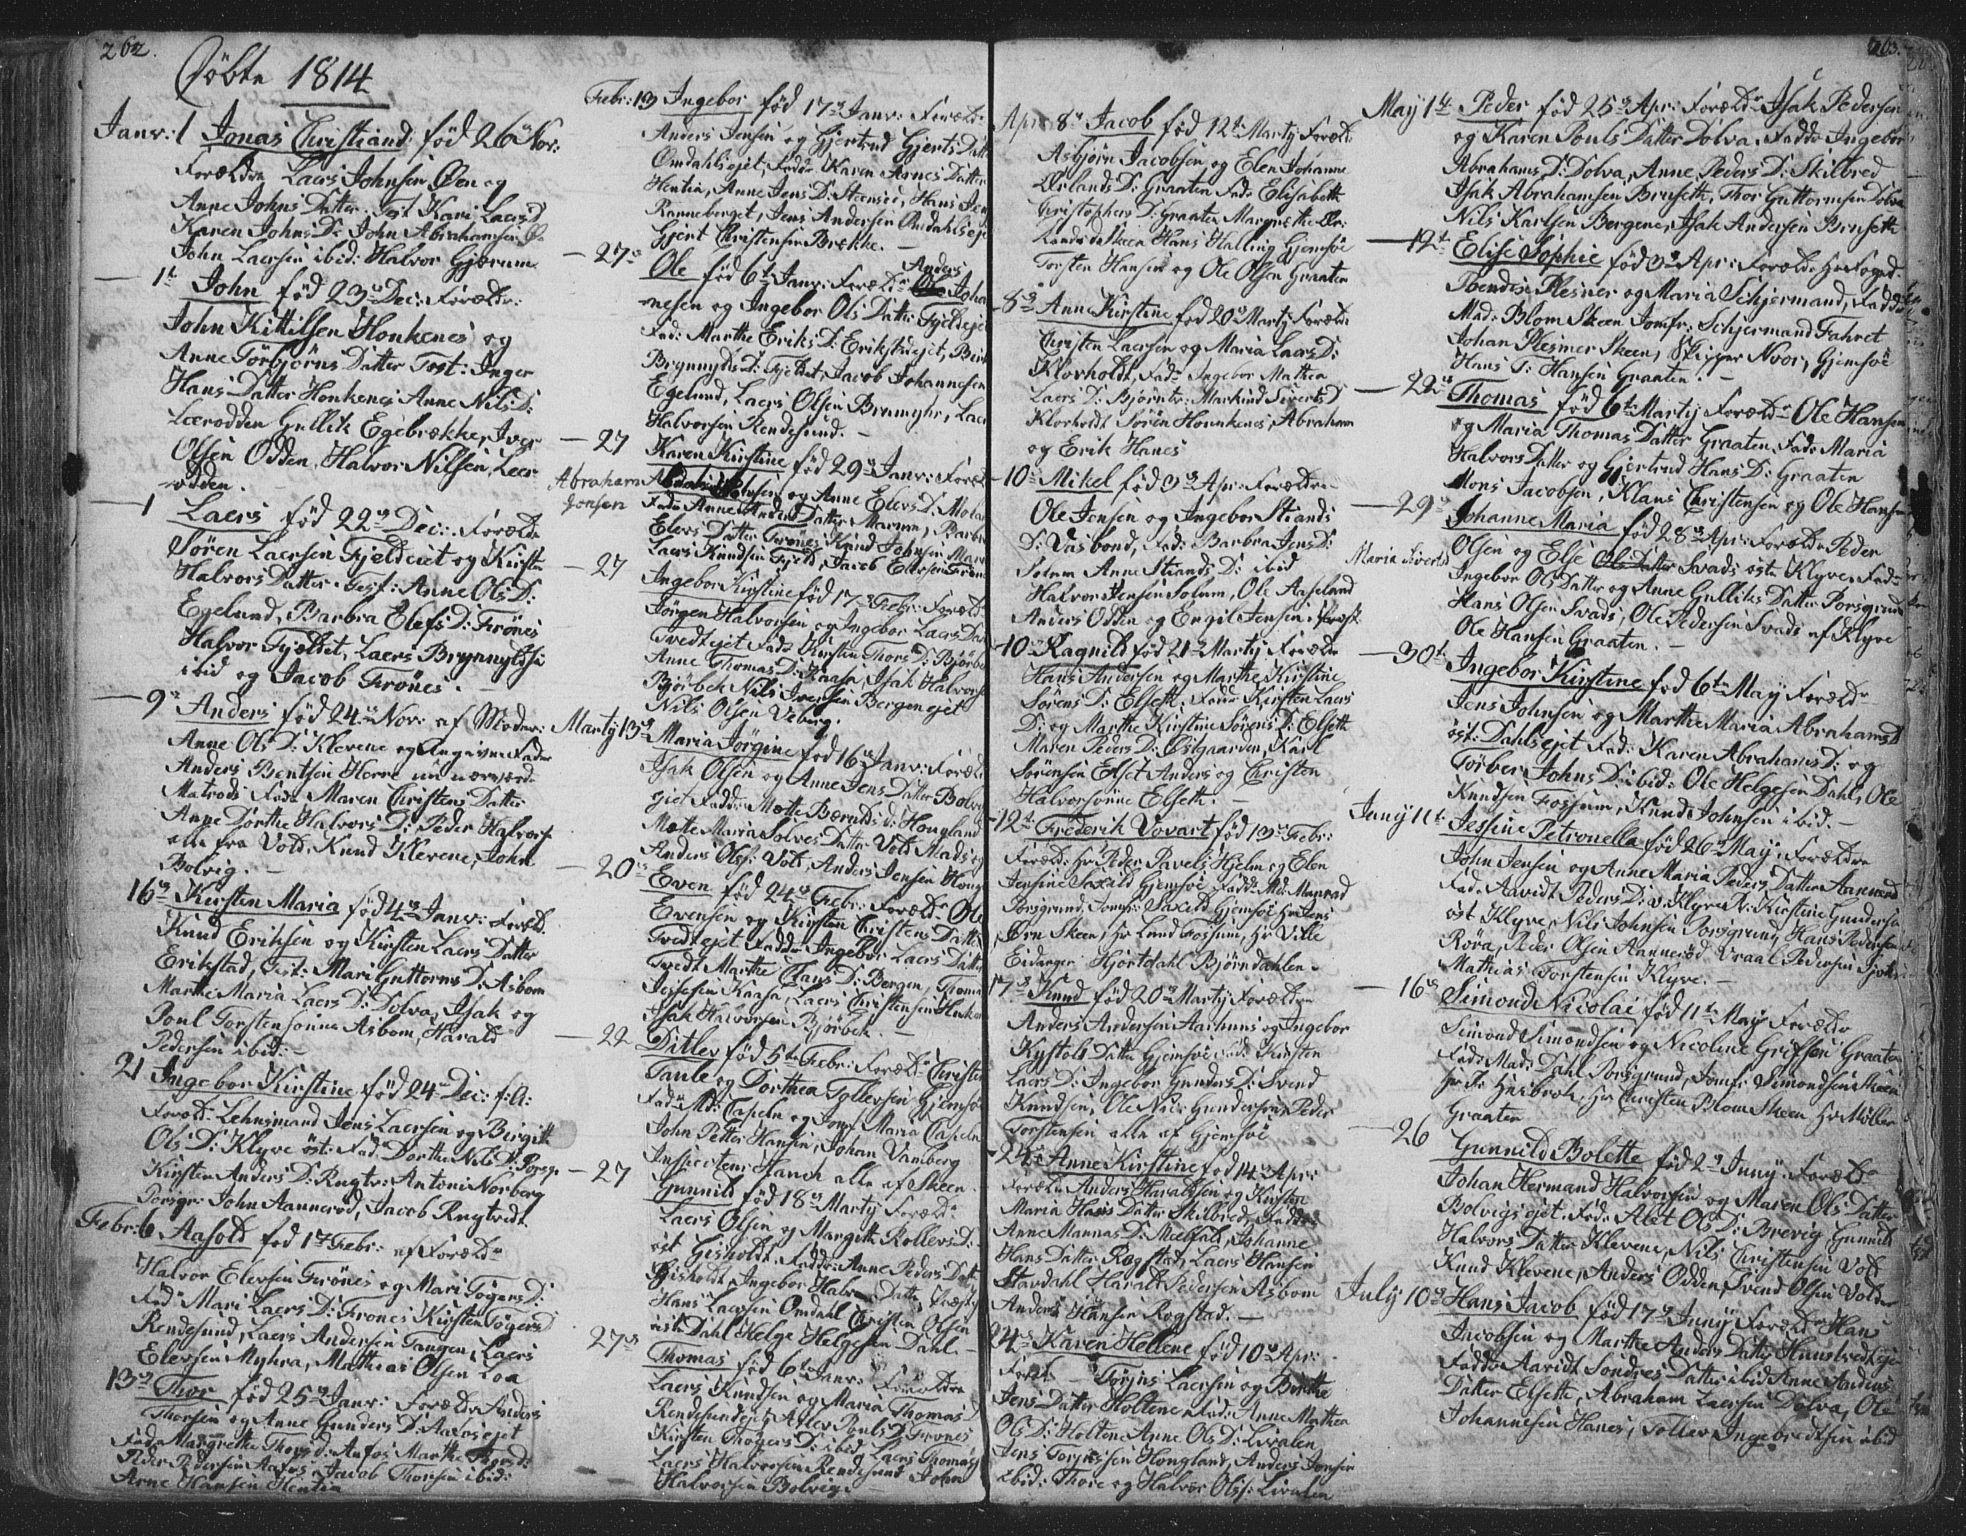 SAKO, Solum kirkebøker, F/Fa/L0003: Ministerialbok nr. I 3, 1761-1814, s. 262-263